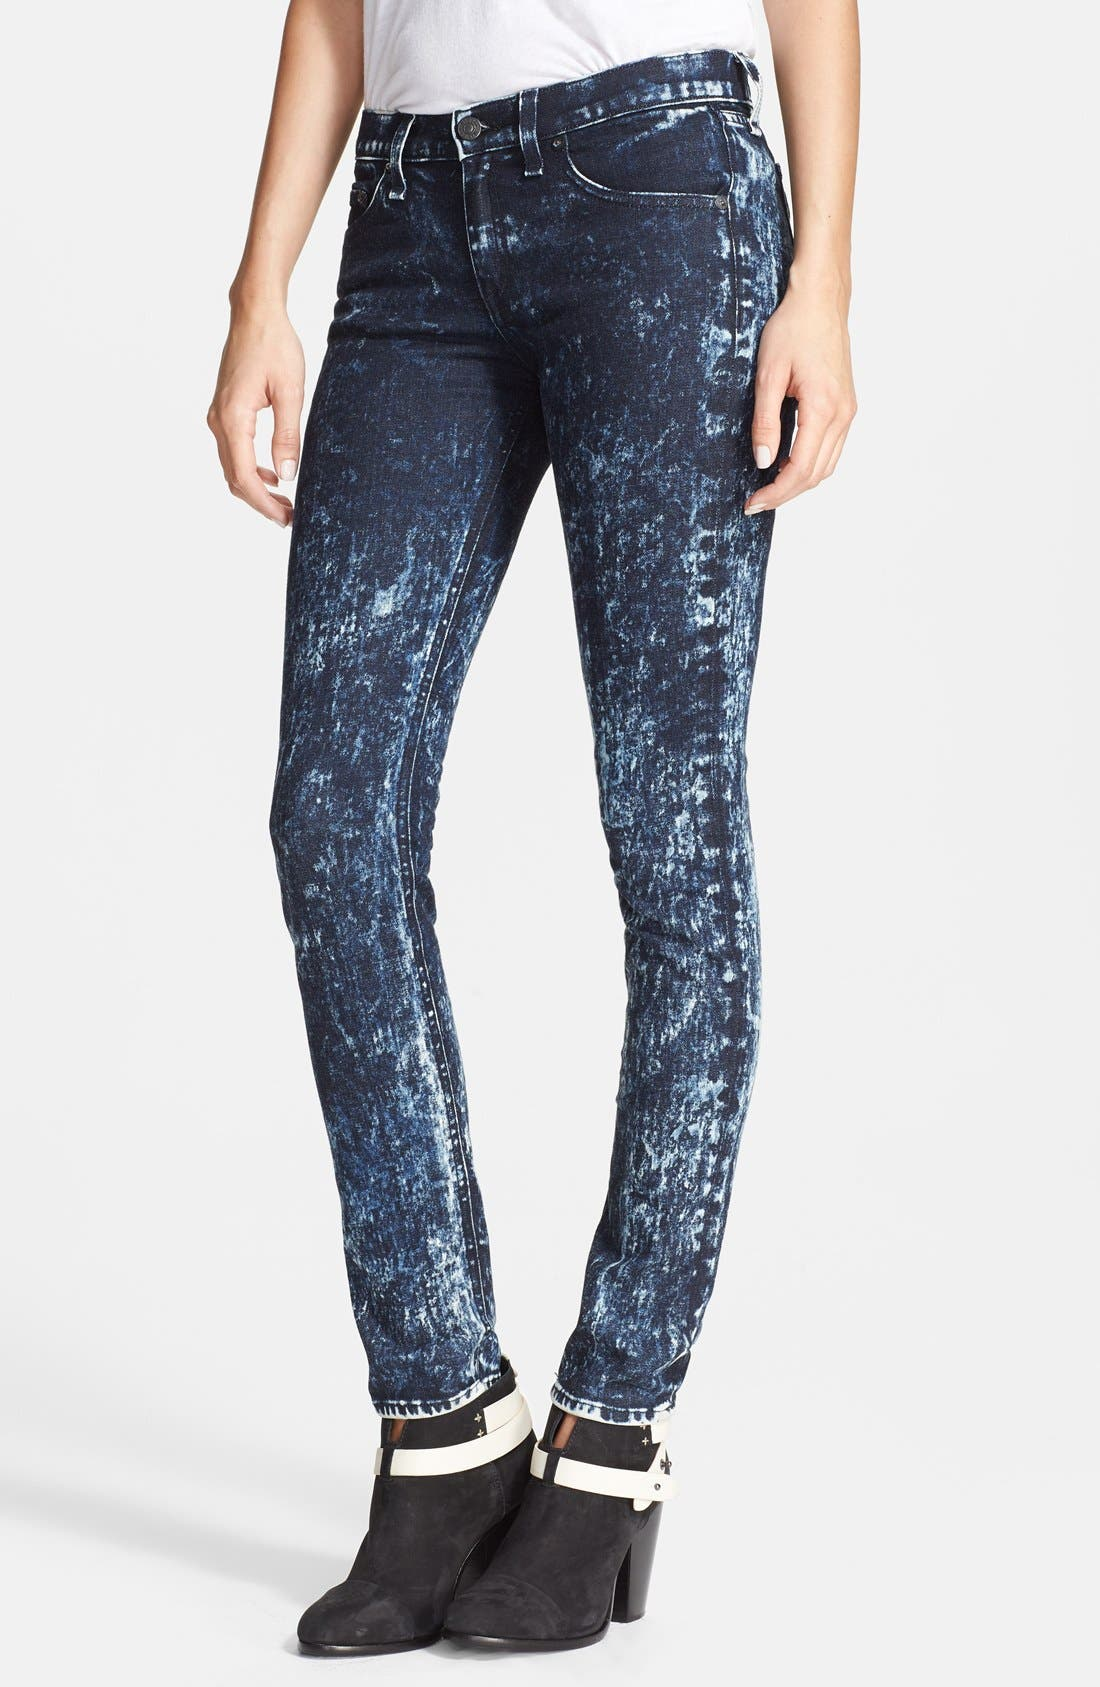 Alternate Image 1 Selected - rag & bone/JEAN Stretch Skinny Jeans (Acid Wash/Black/White)